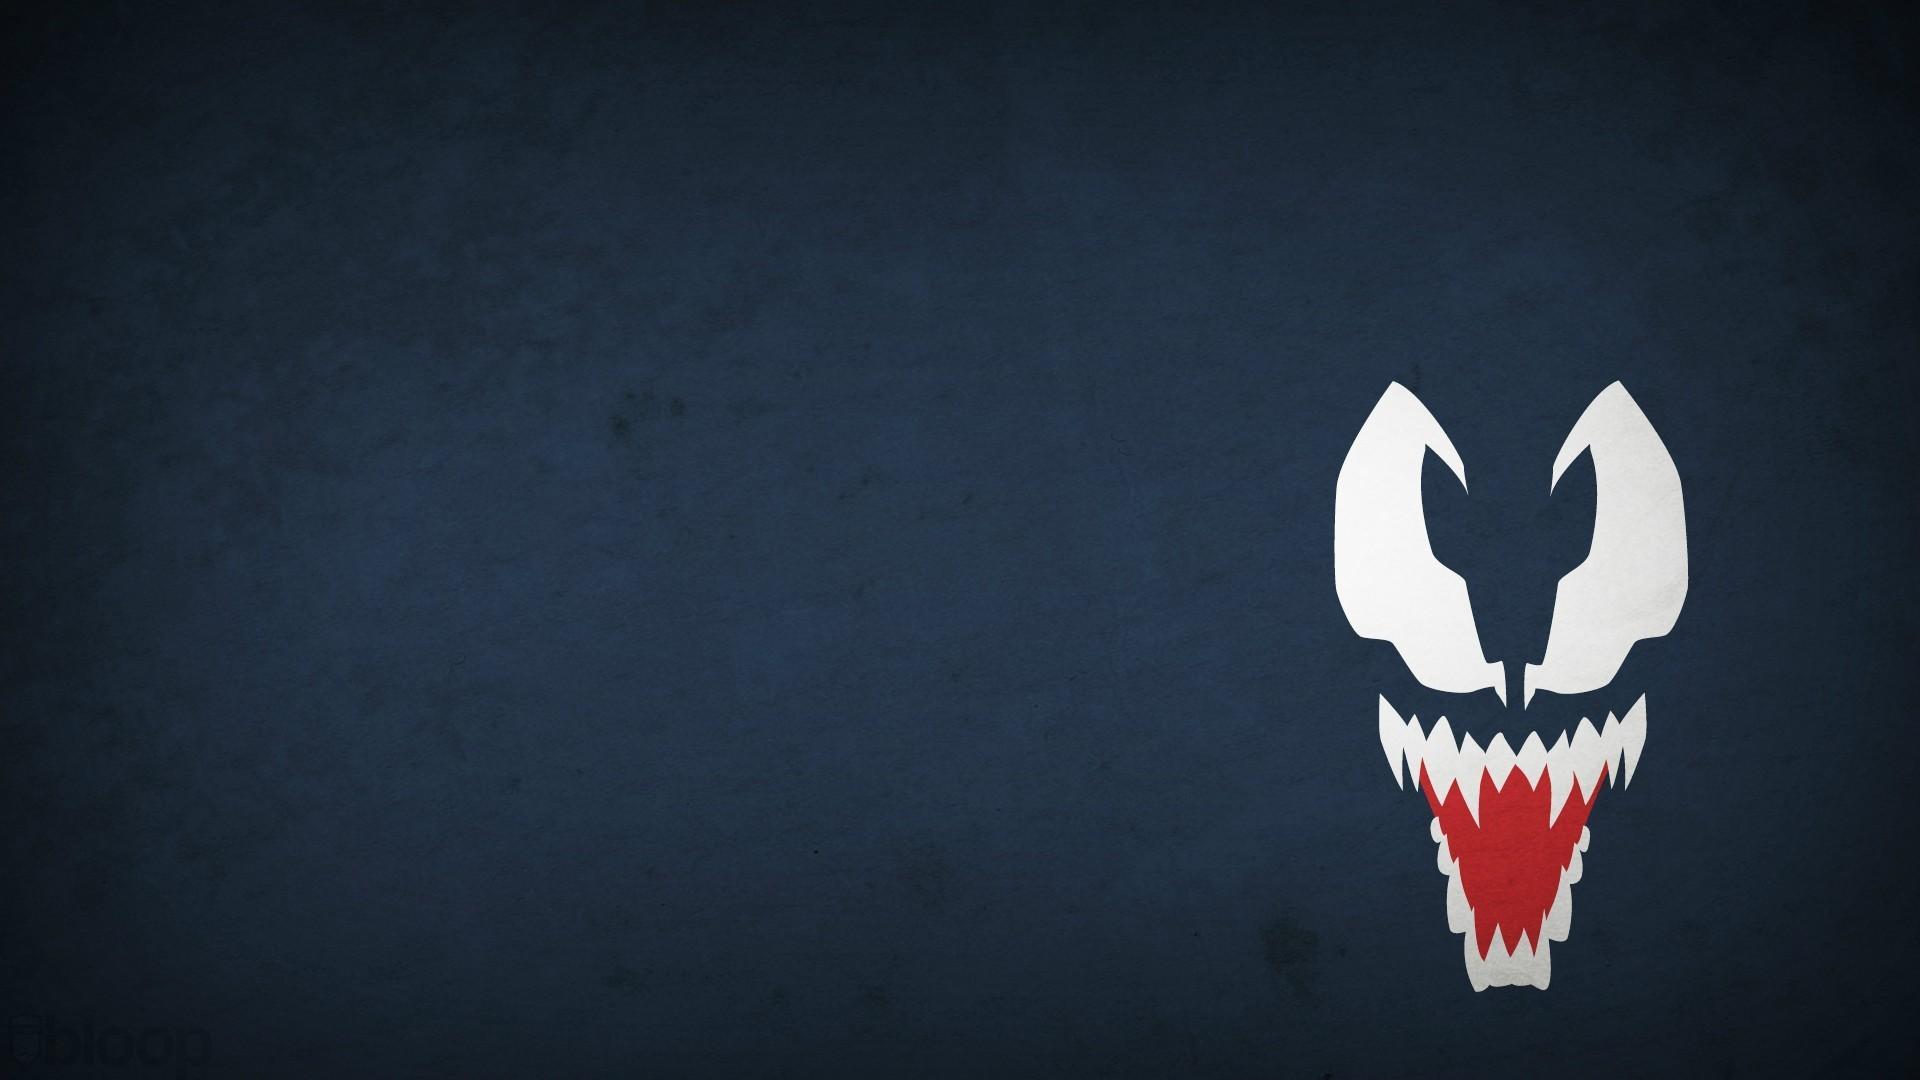 General 1920x1080 minimalism artwork cartoon blue Blo0p Marvel Comics villains Venom